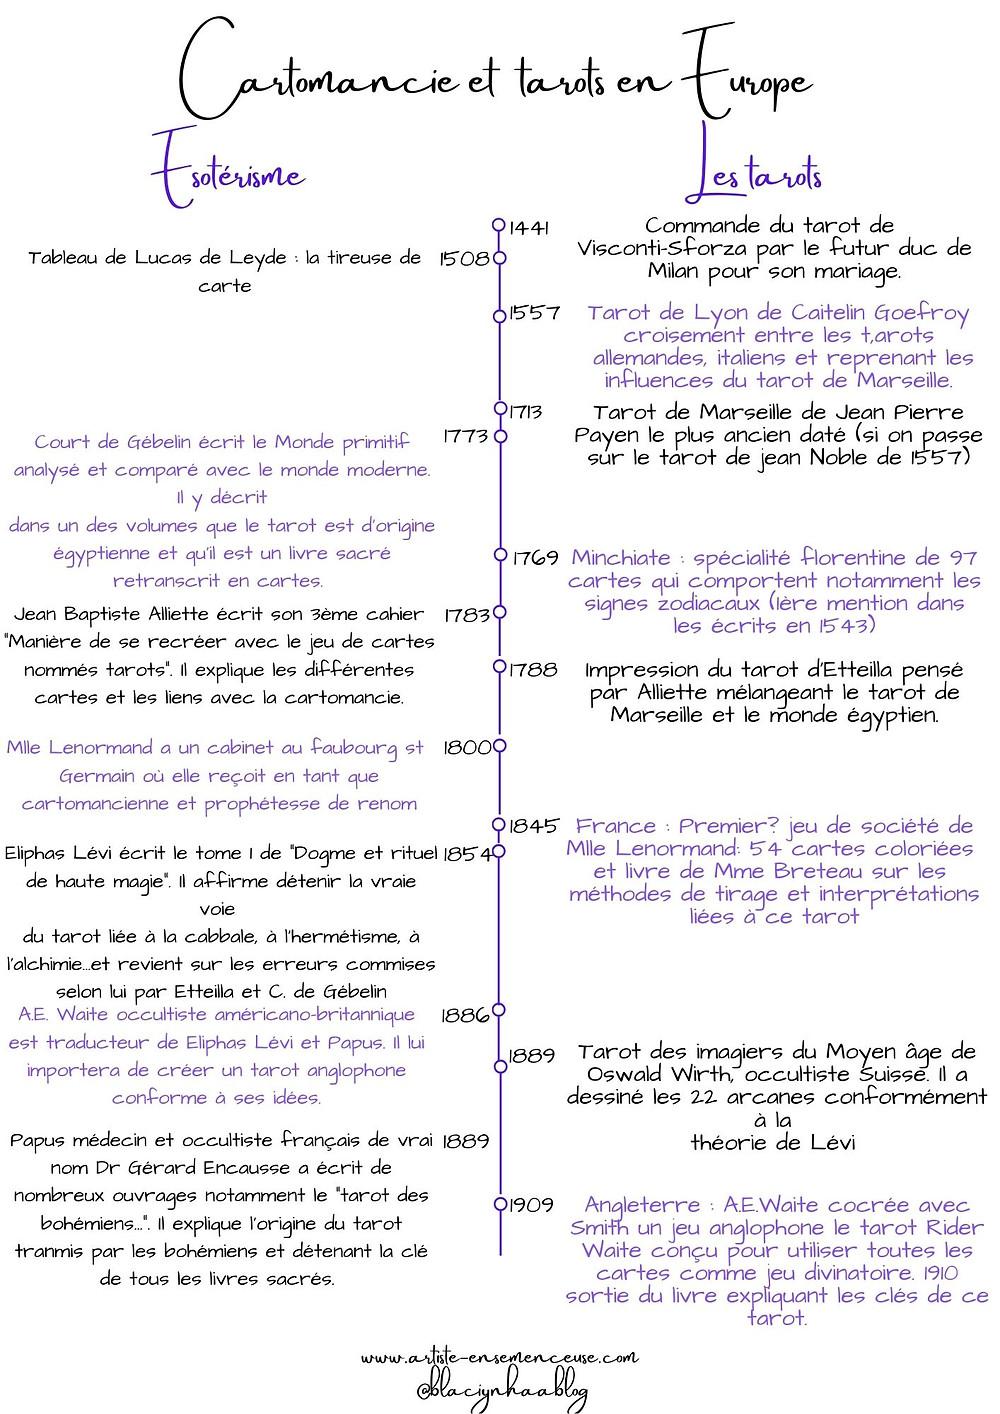 chronologie cartomancie et tarots en Europe blaçiy nhaa @blacinhaablog